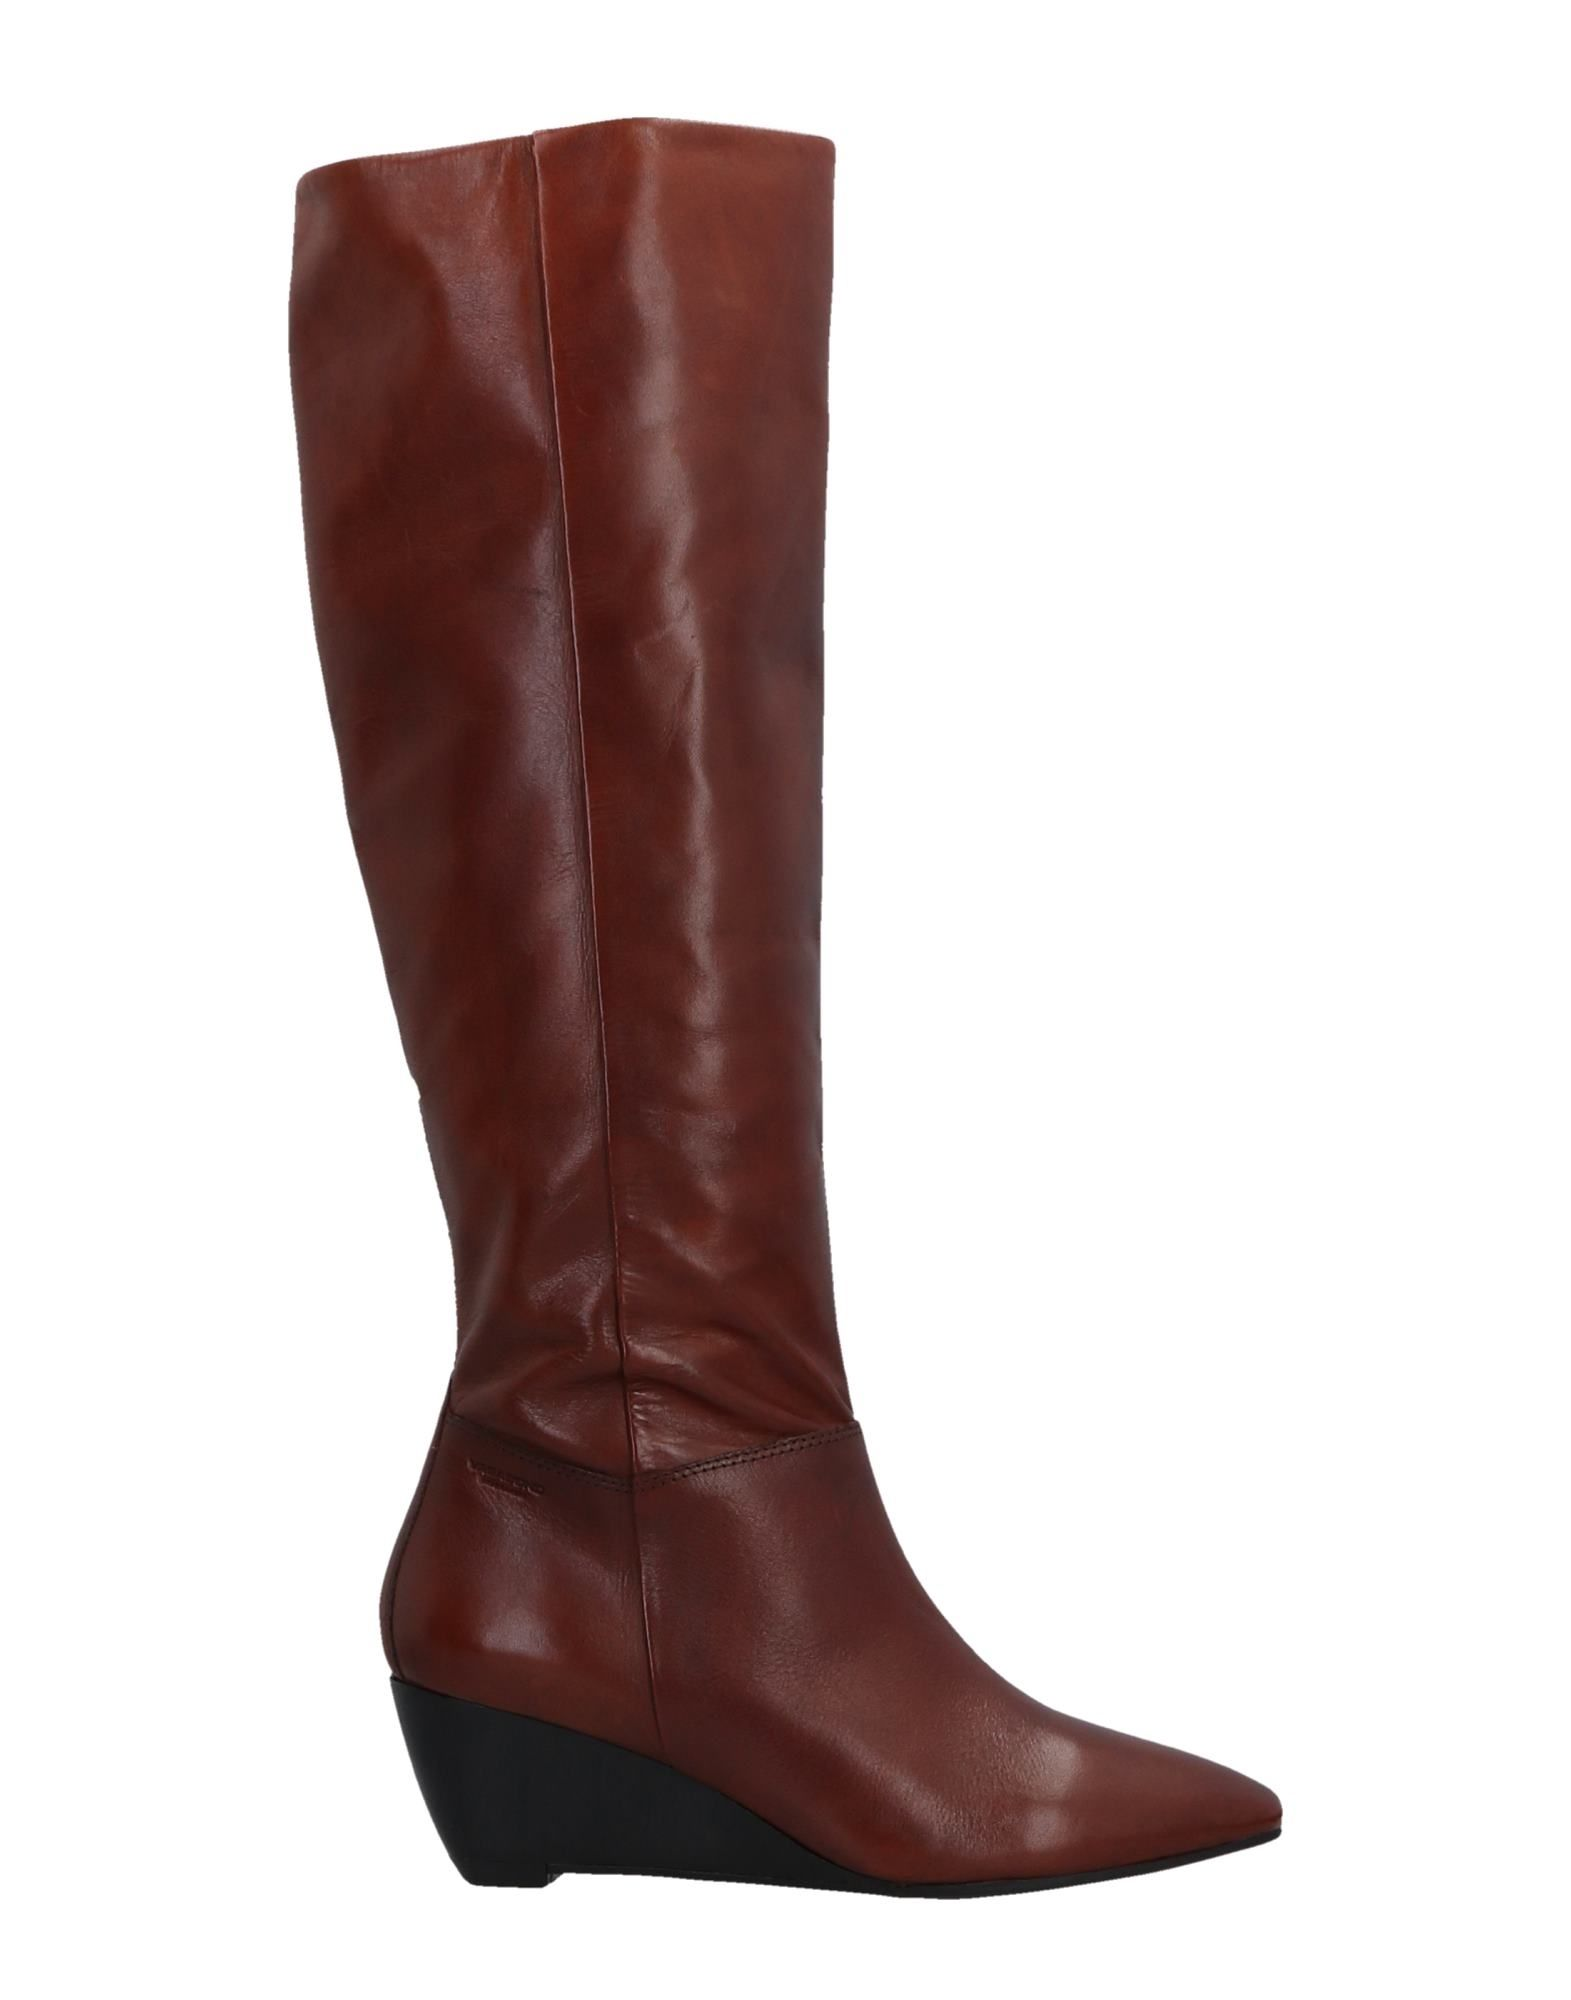 Stivali Vagabond Shoemakers Donna - 11513101KT